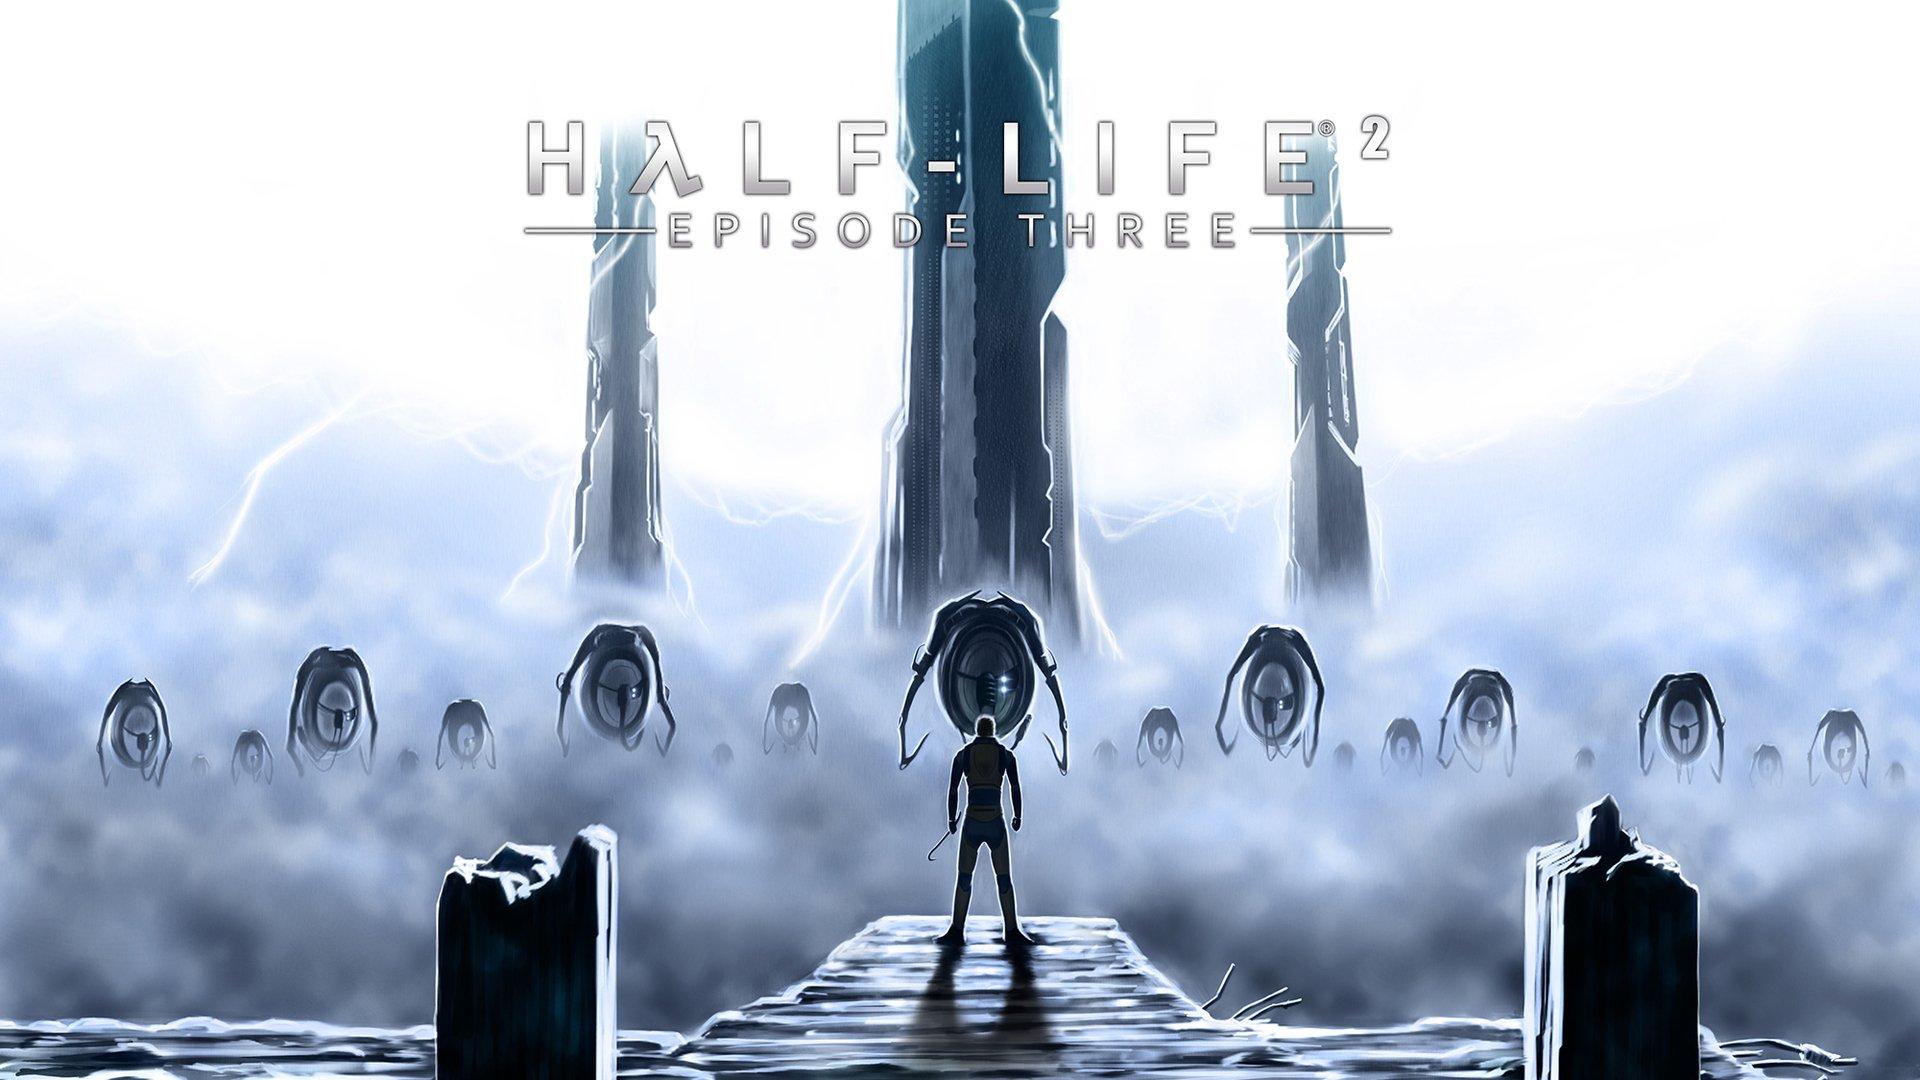 Half Life 2 Hd Wallpaper Background Image 1920x1080 Id